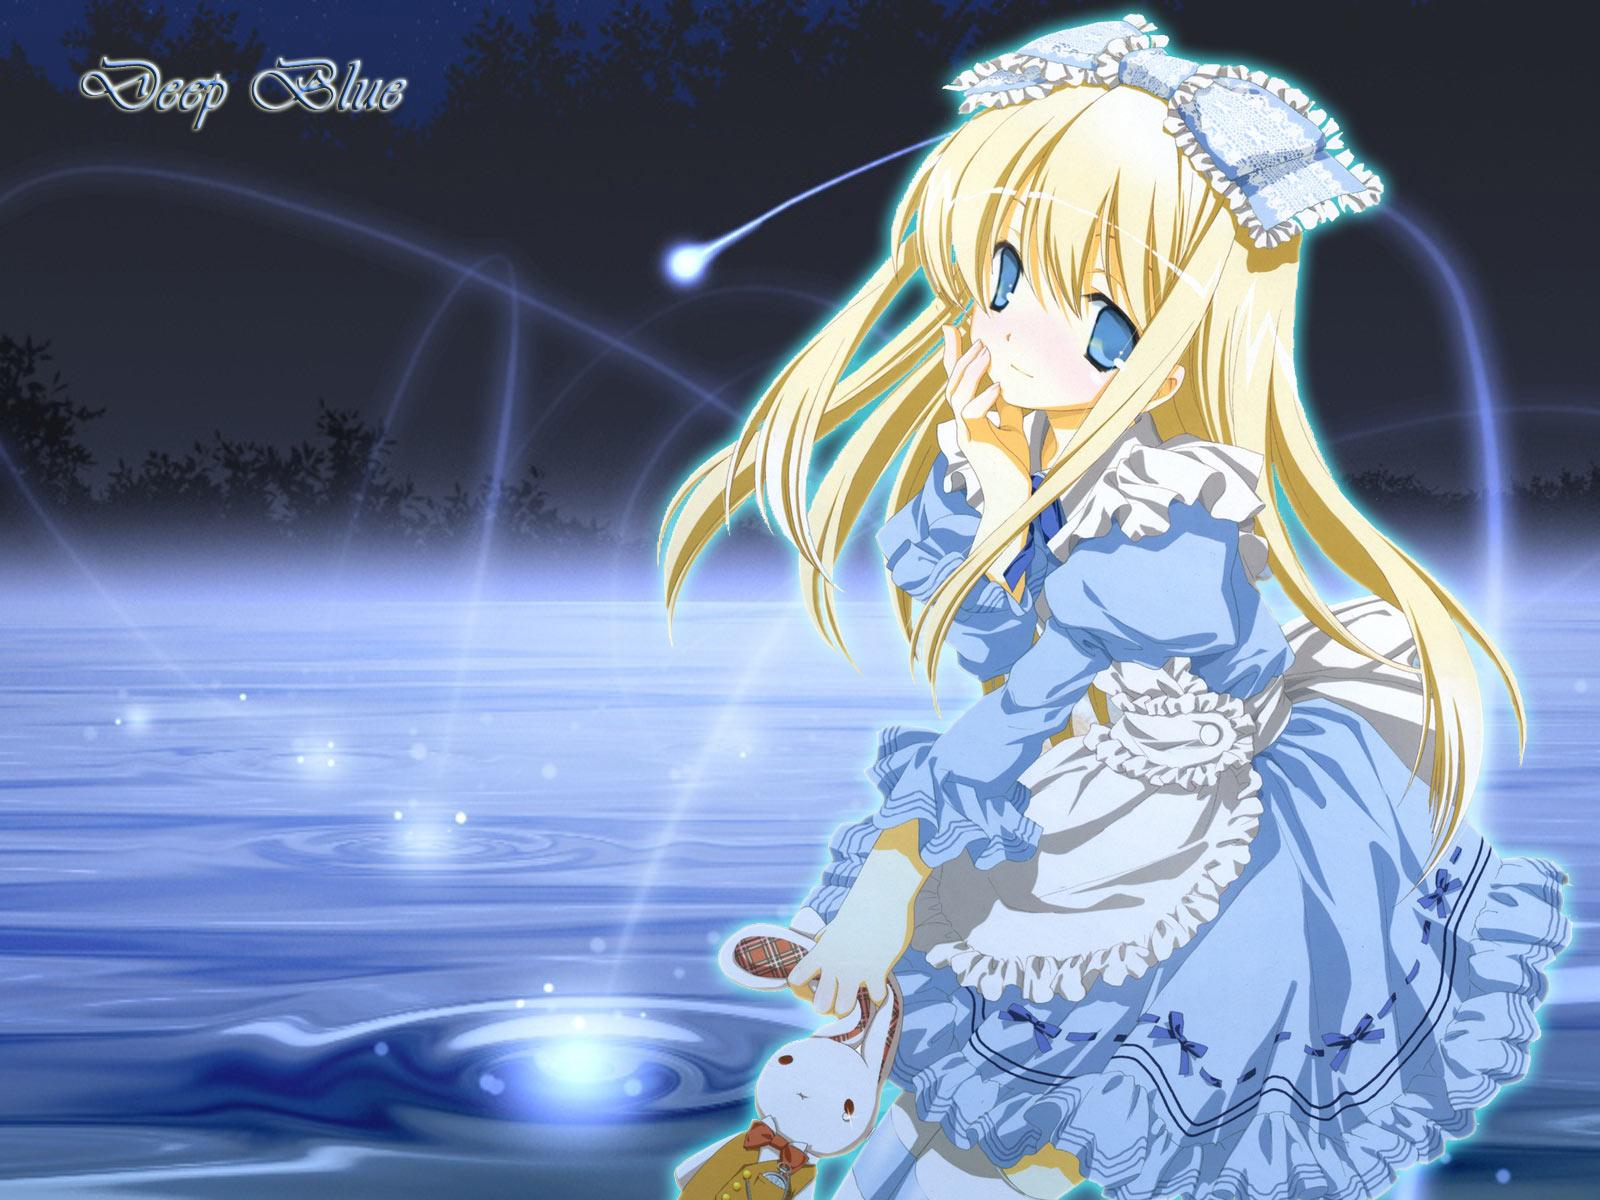 http://4.bp.blogspot.com/-pqUBgj34kk0/Tmkg8HD5Q7I/AAAAAAAAAJI/4G0qBobjFlE/s1600/724170wallpaper-blue-girl-anime.jpg